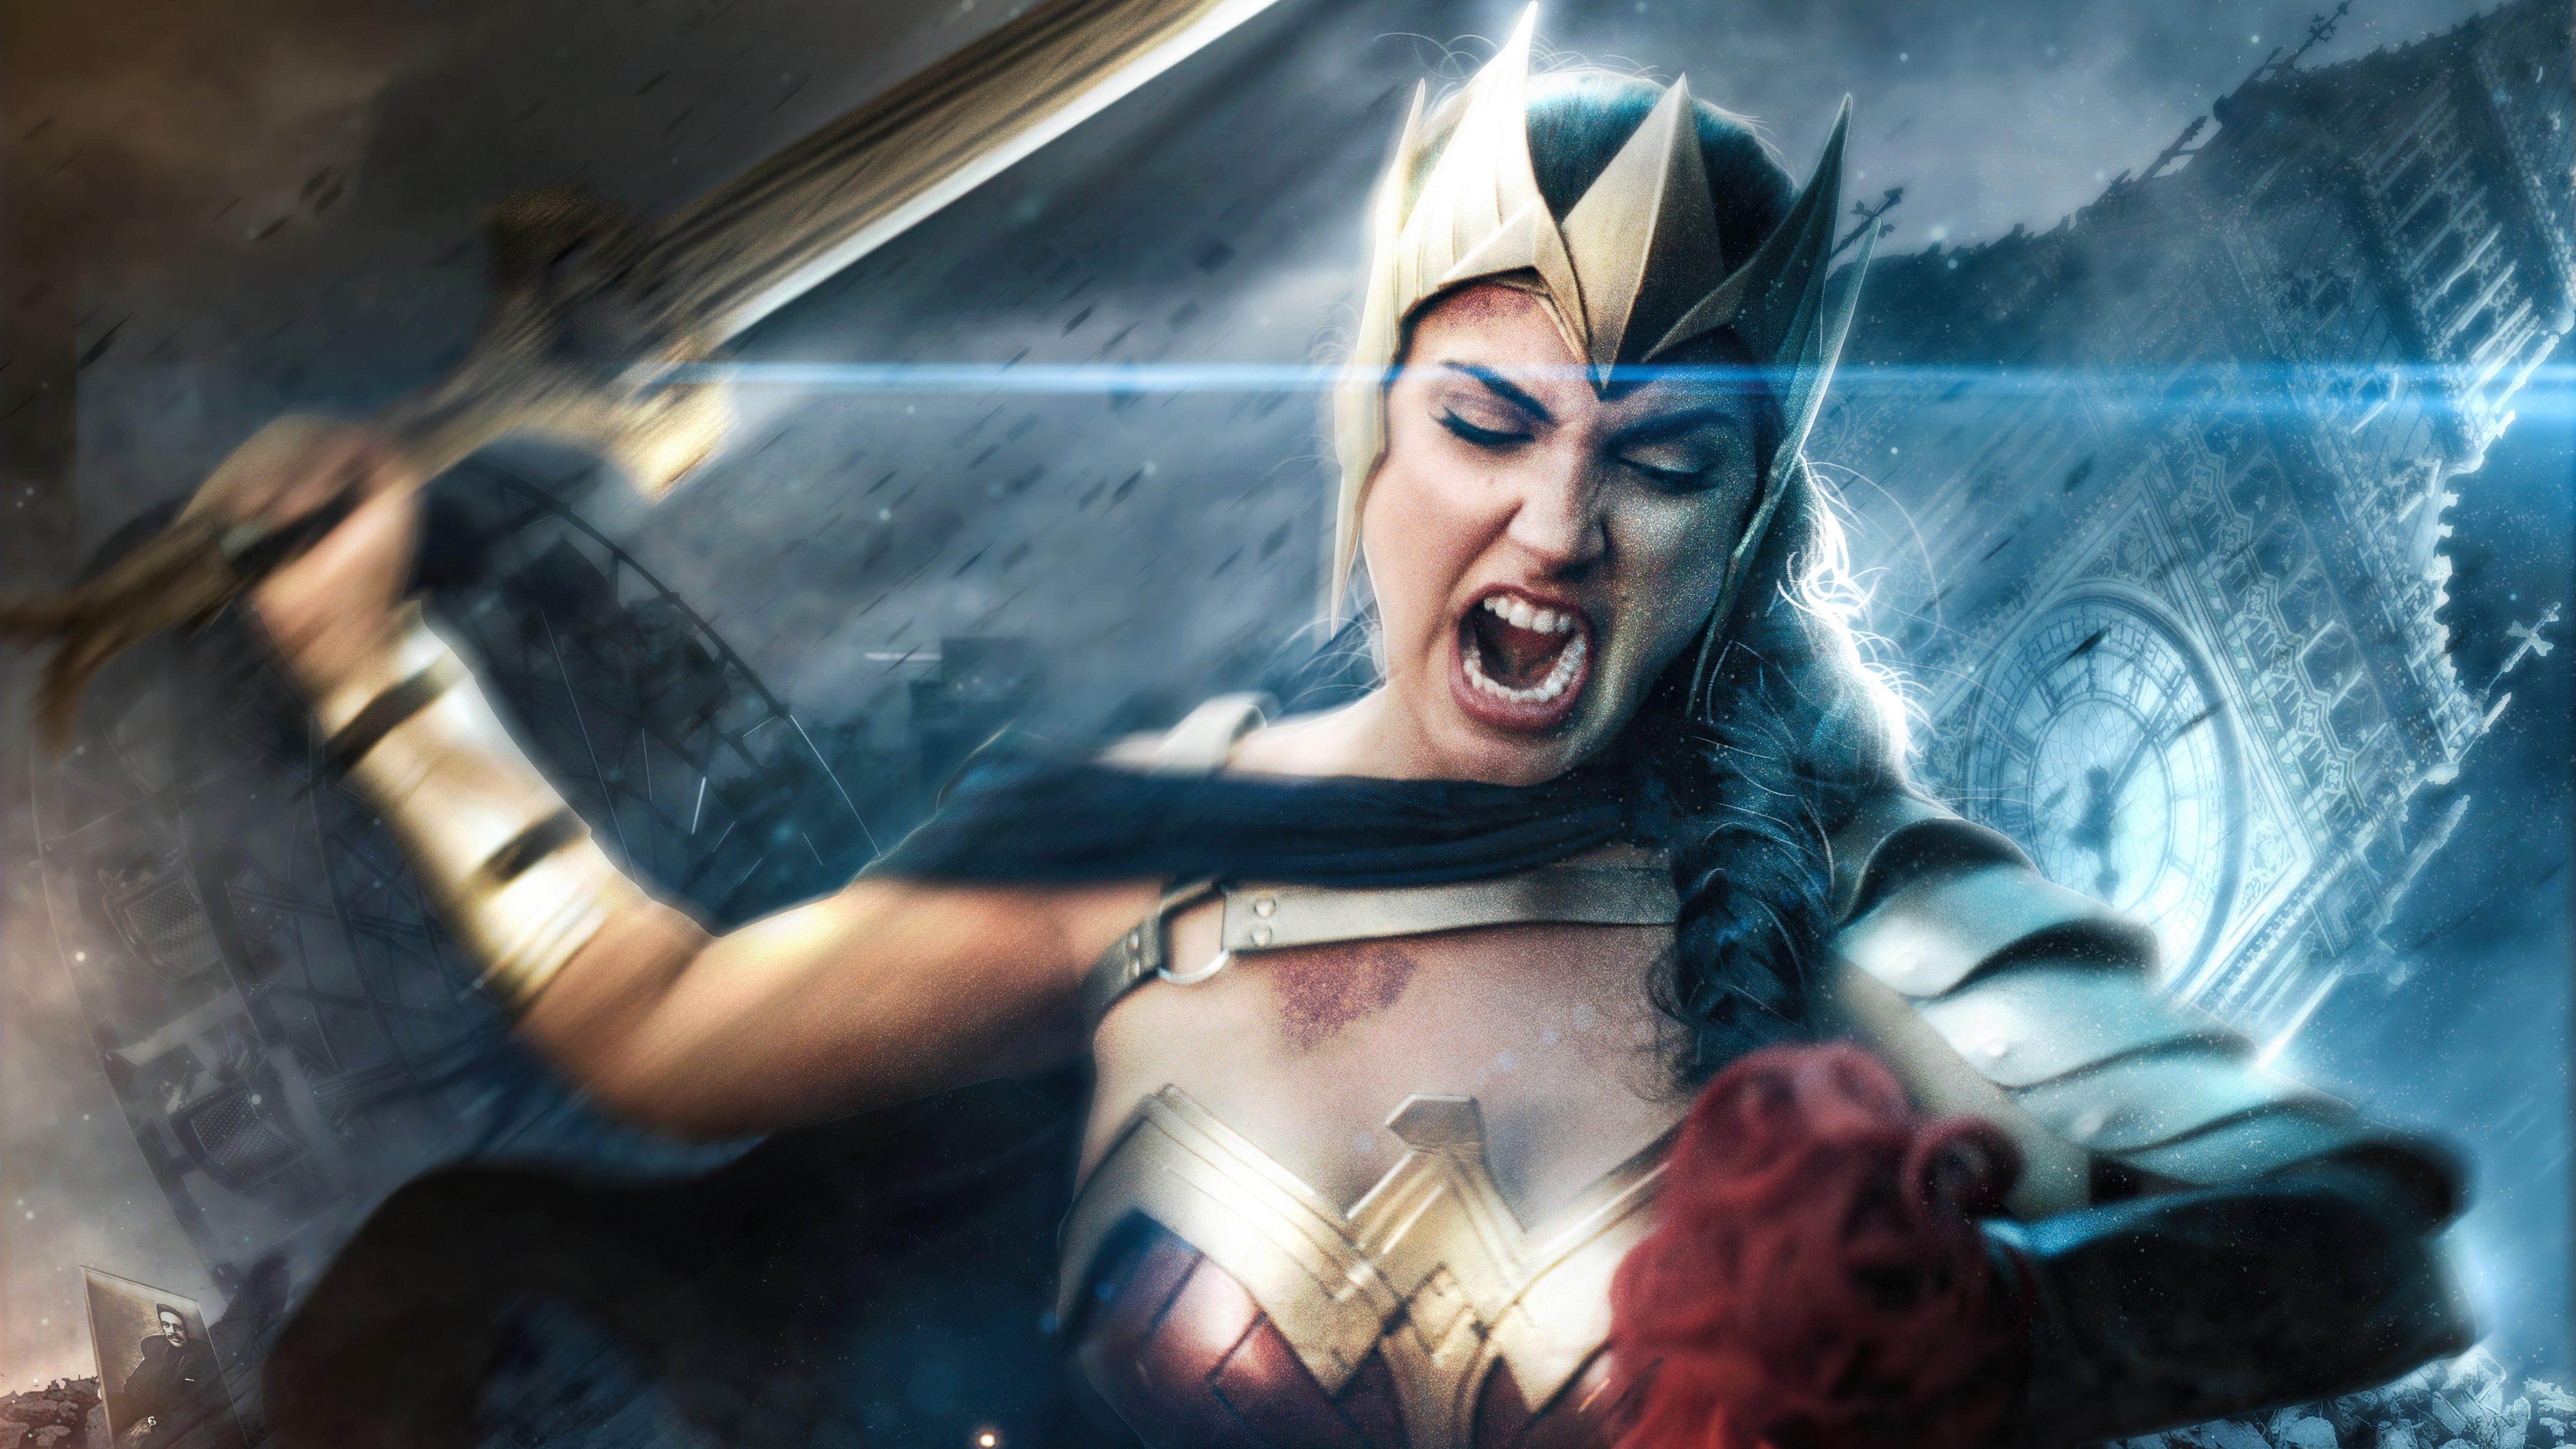 Wallpaper Wonder Woman angry